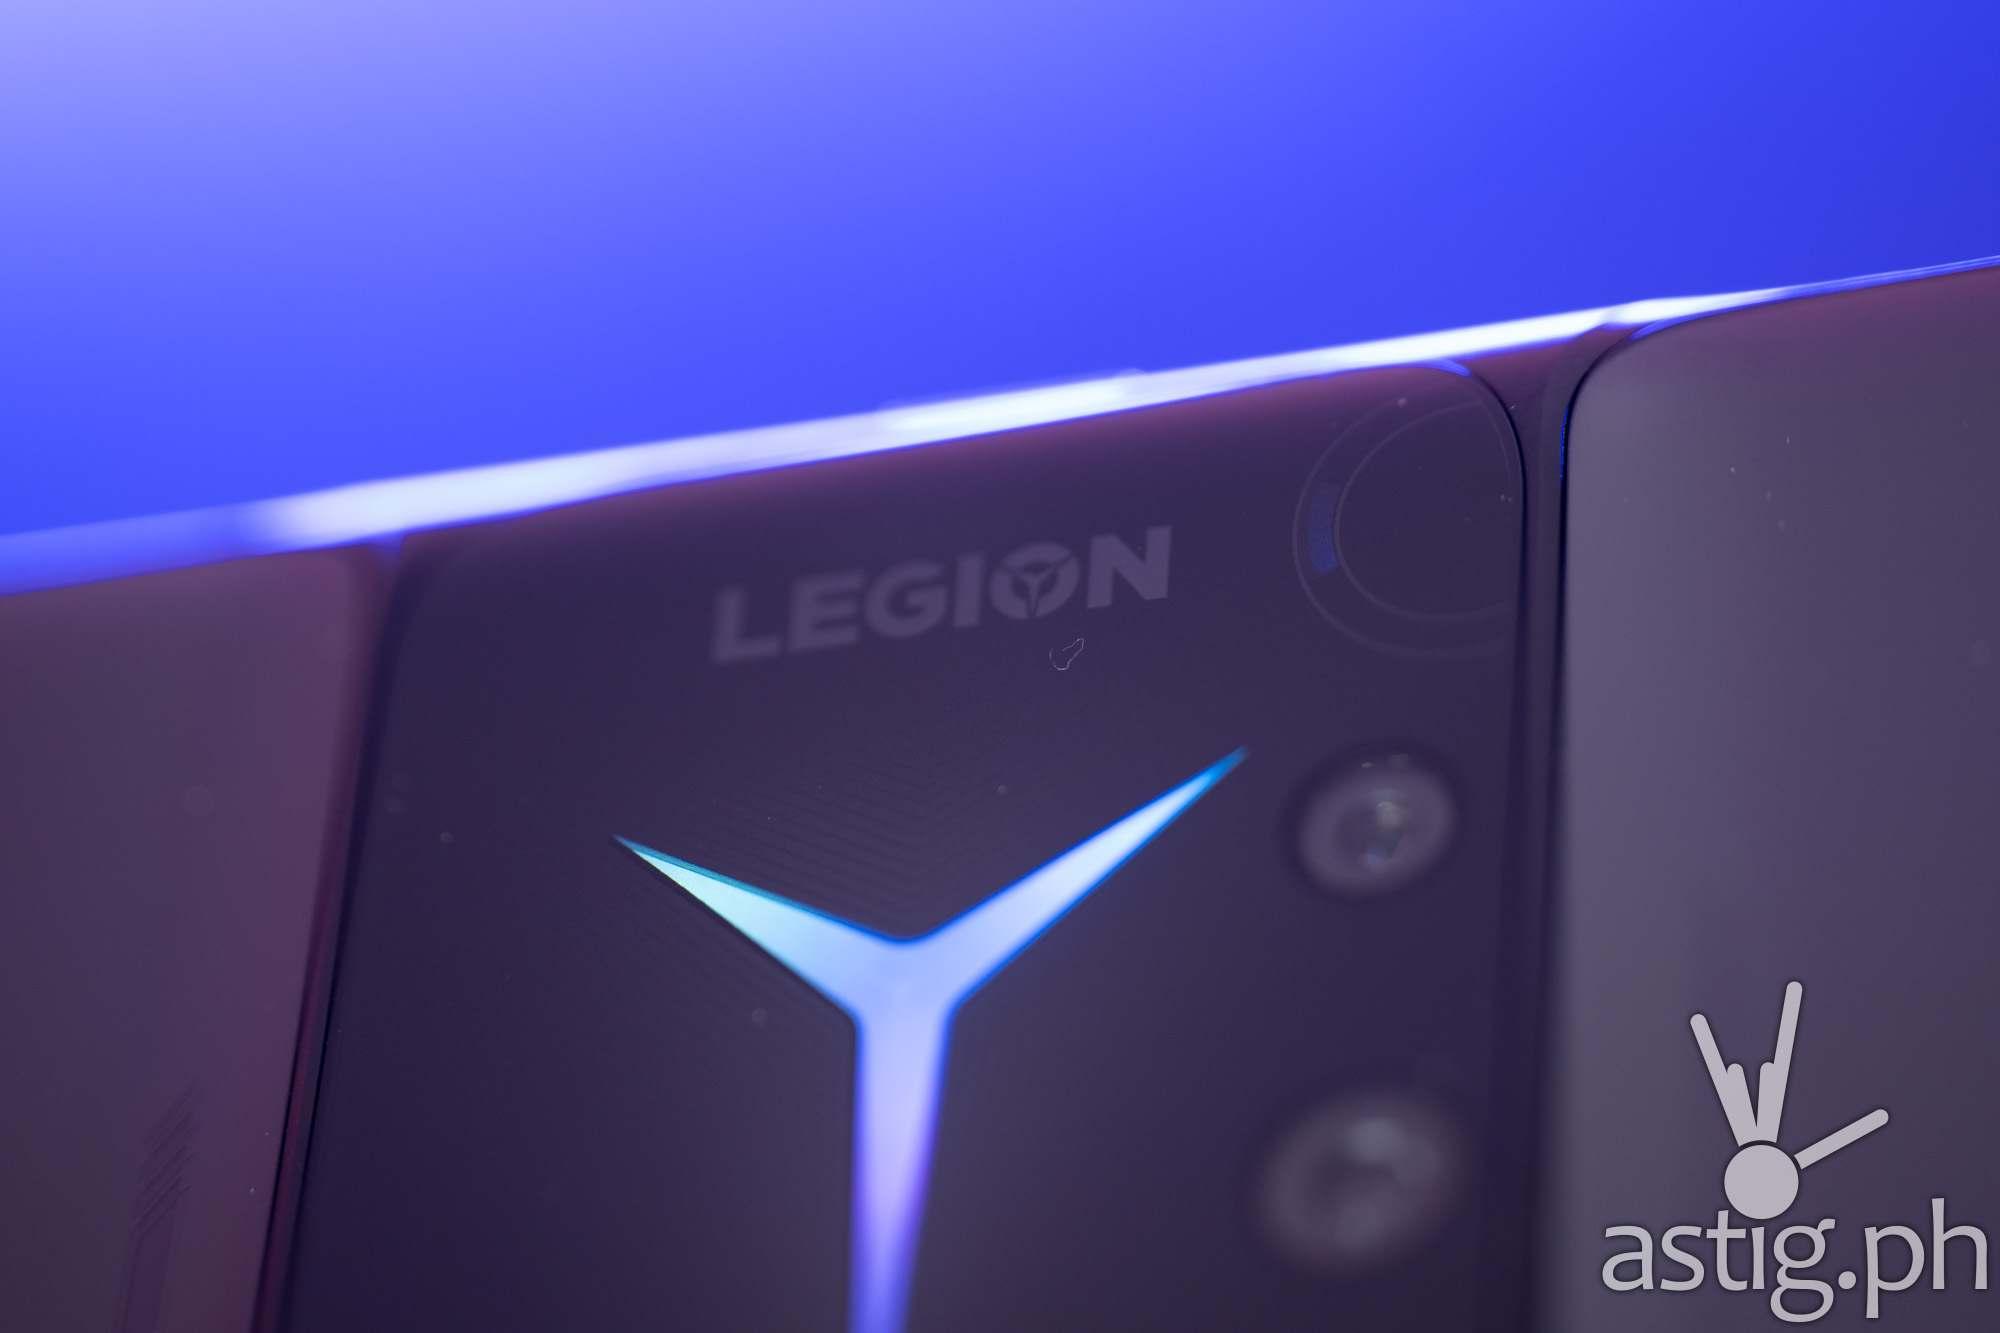 Legion RGB logo, mini fan - Legion Phone Duel 2 (Philippines)